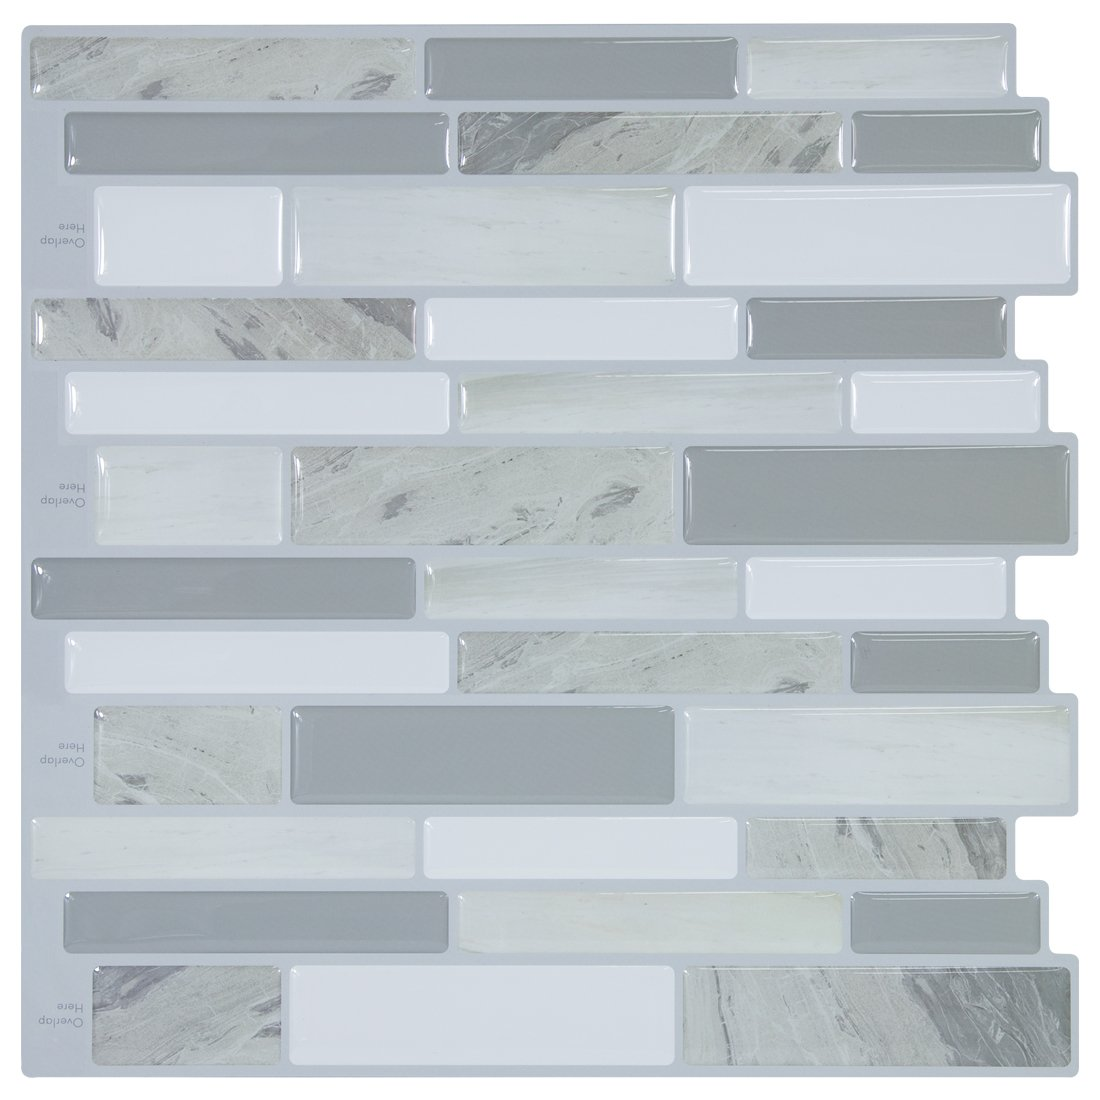 Hue Decoration Modern Grey Peel And Stick Subway Tiles Vinyl